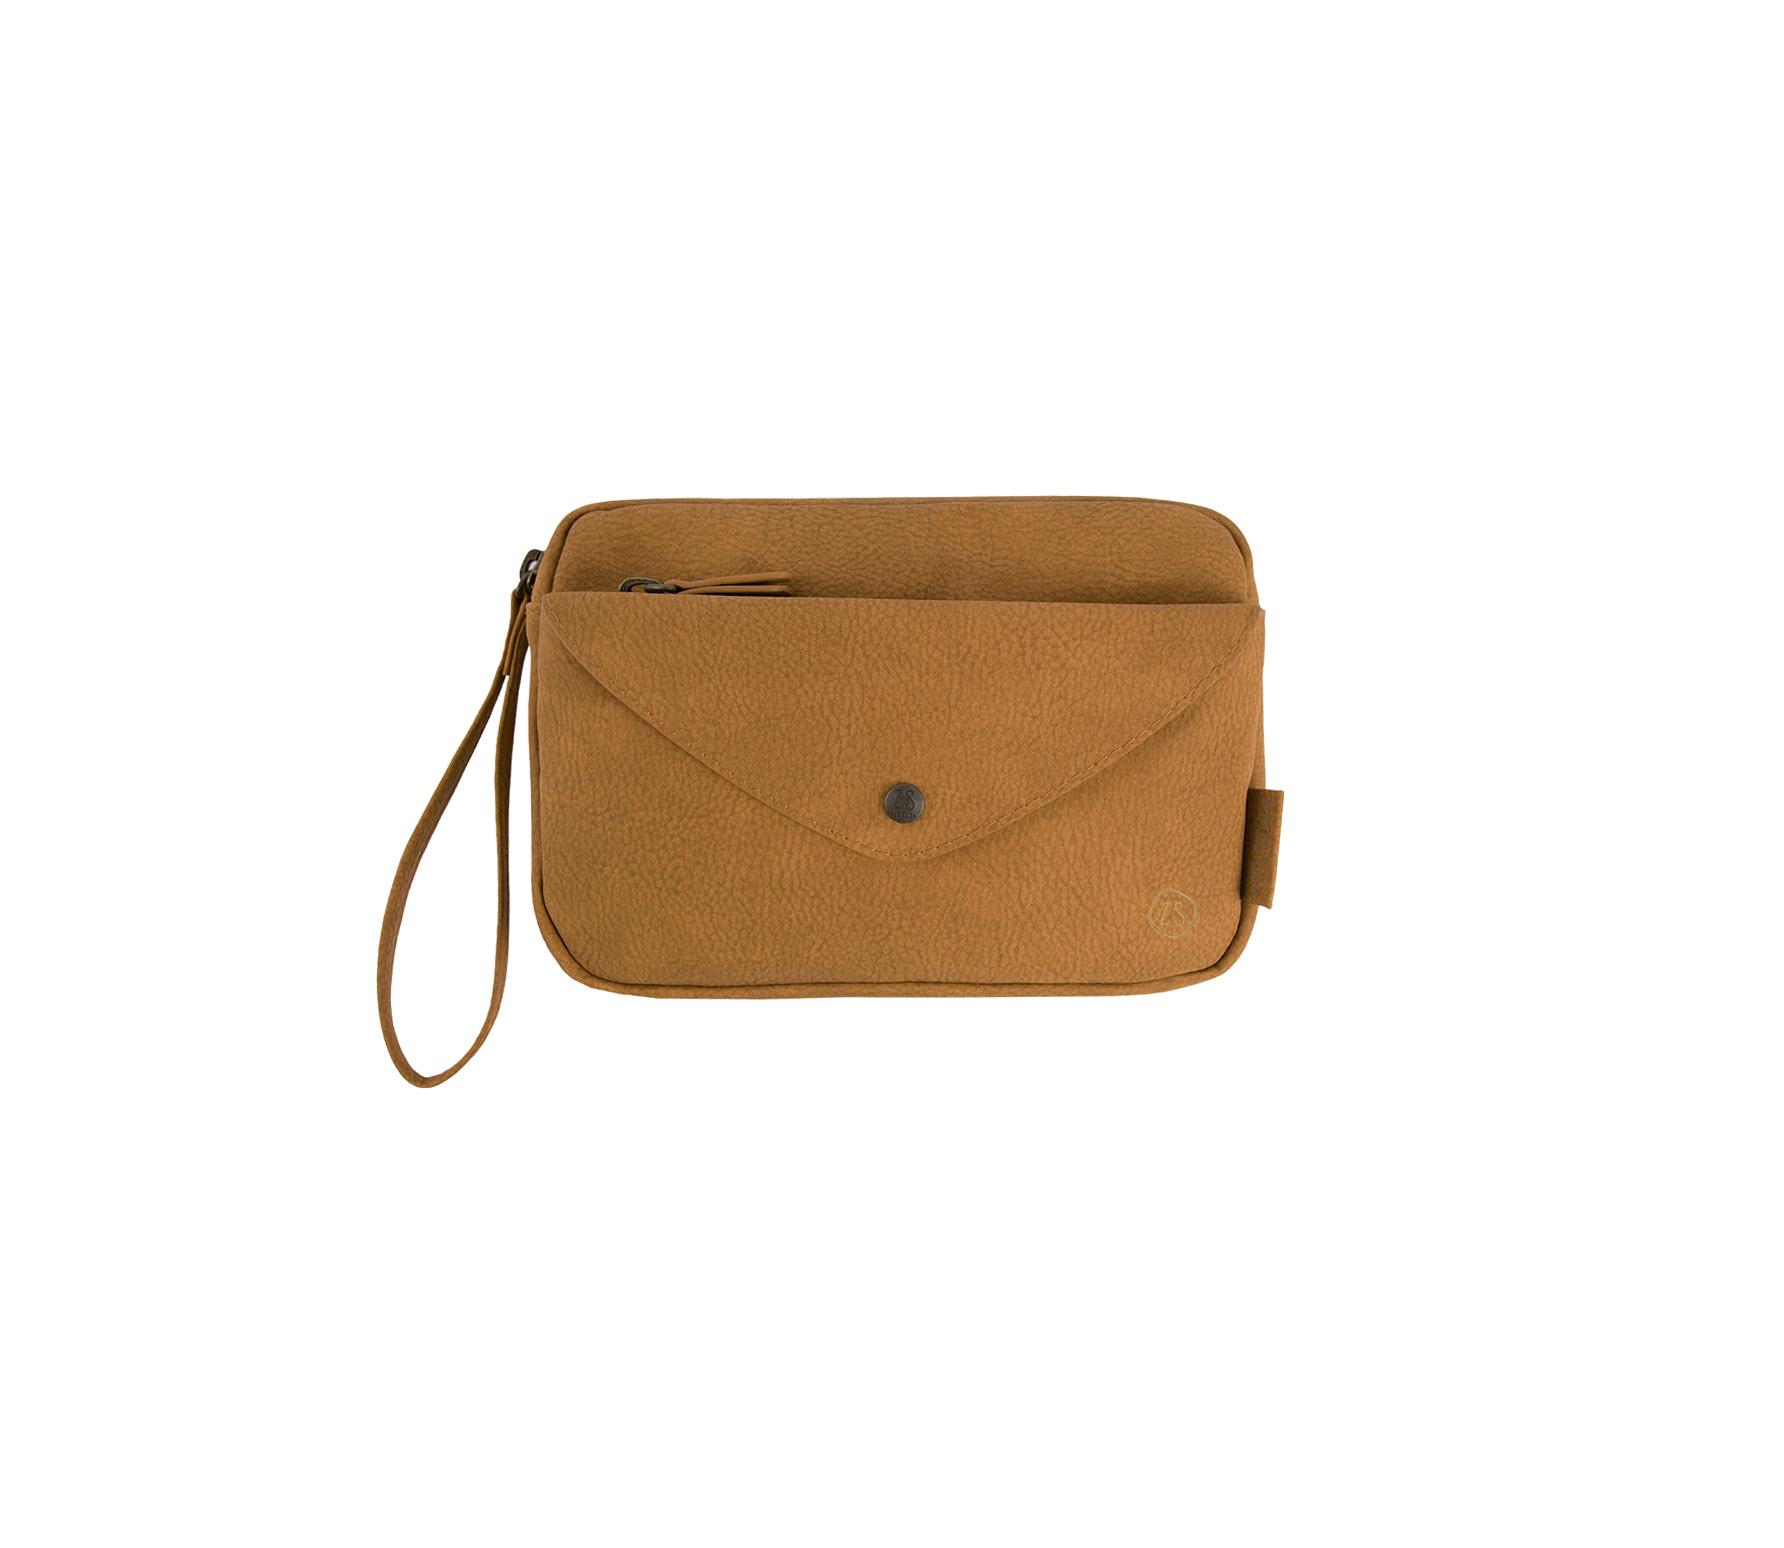 Zusss handige portemonnee-clutch camel pu leder